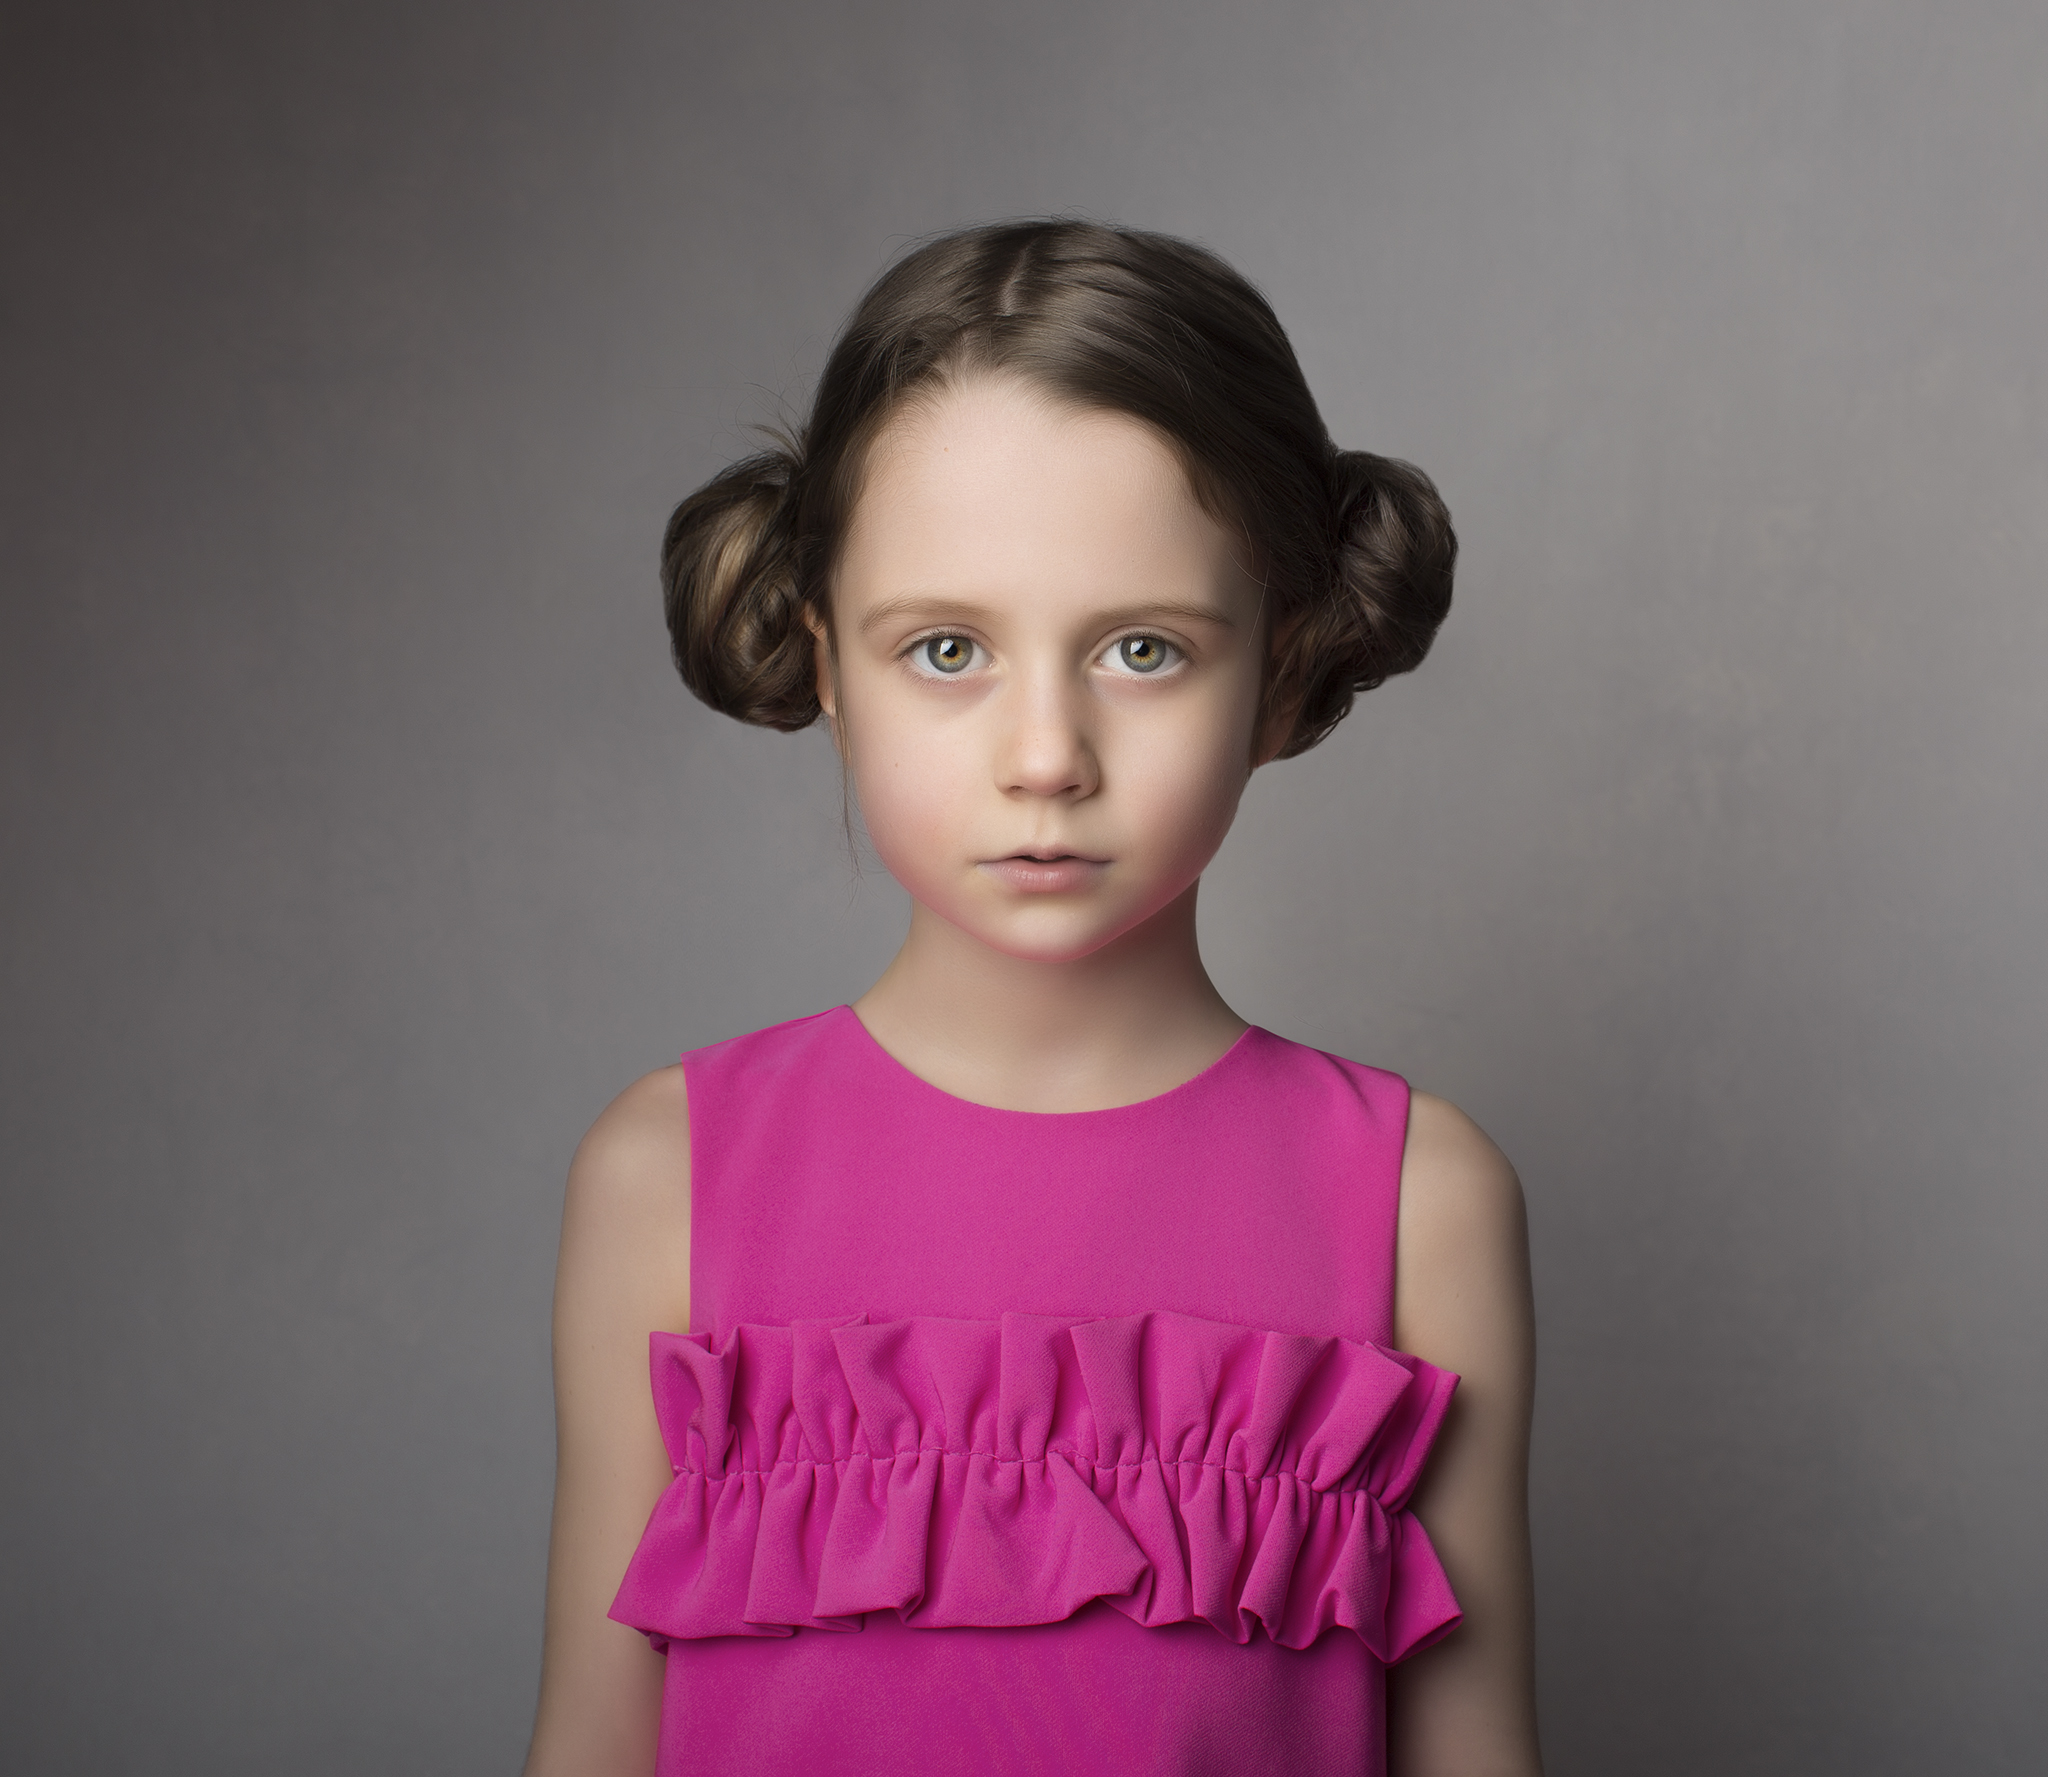 elizabethgphotography_fineart_kingslangley_hertfordshire_child_model_alana_tinyangels_04.jpg